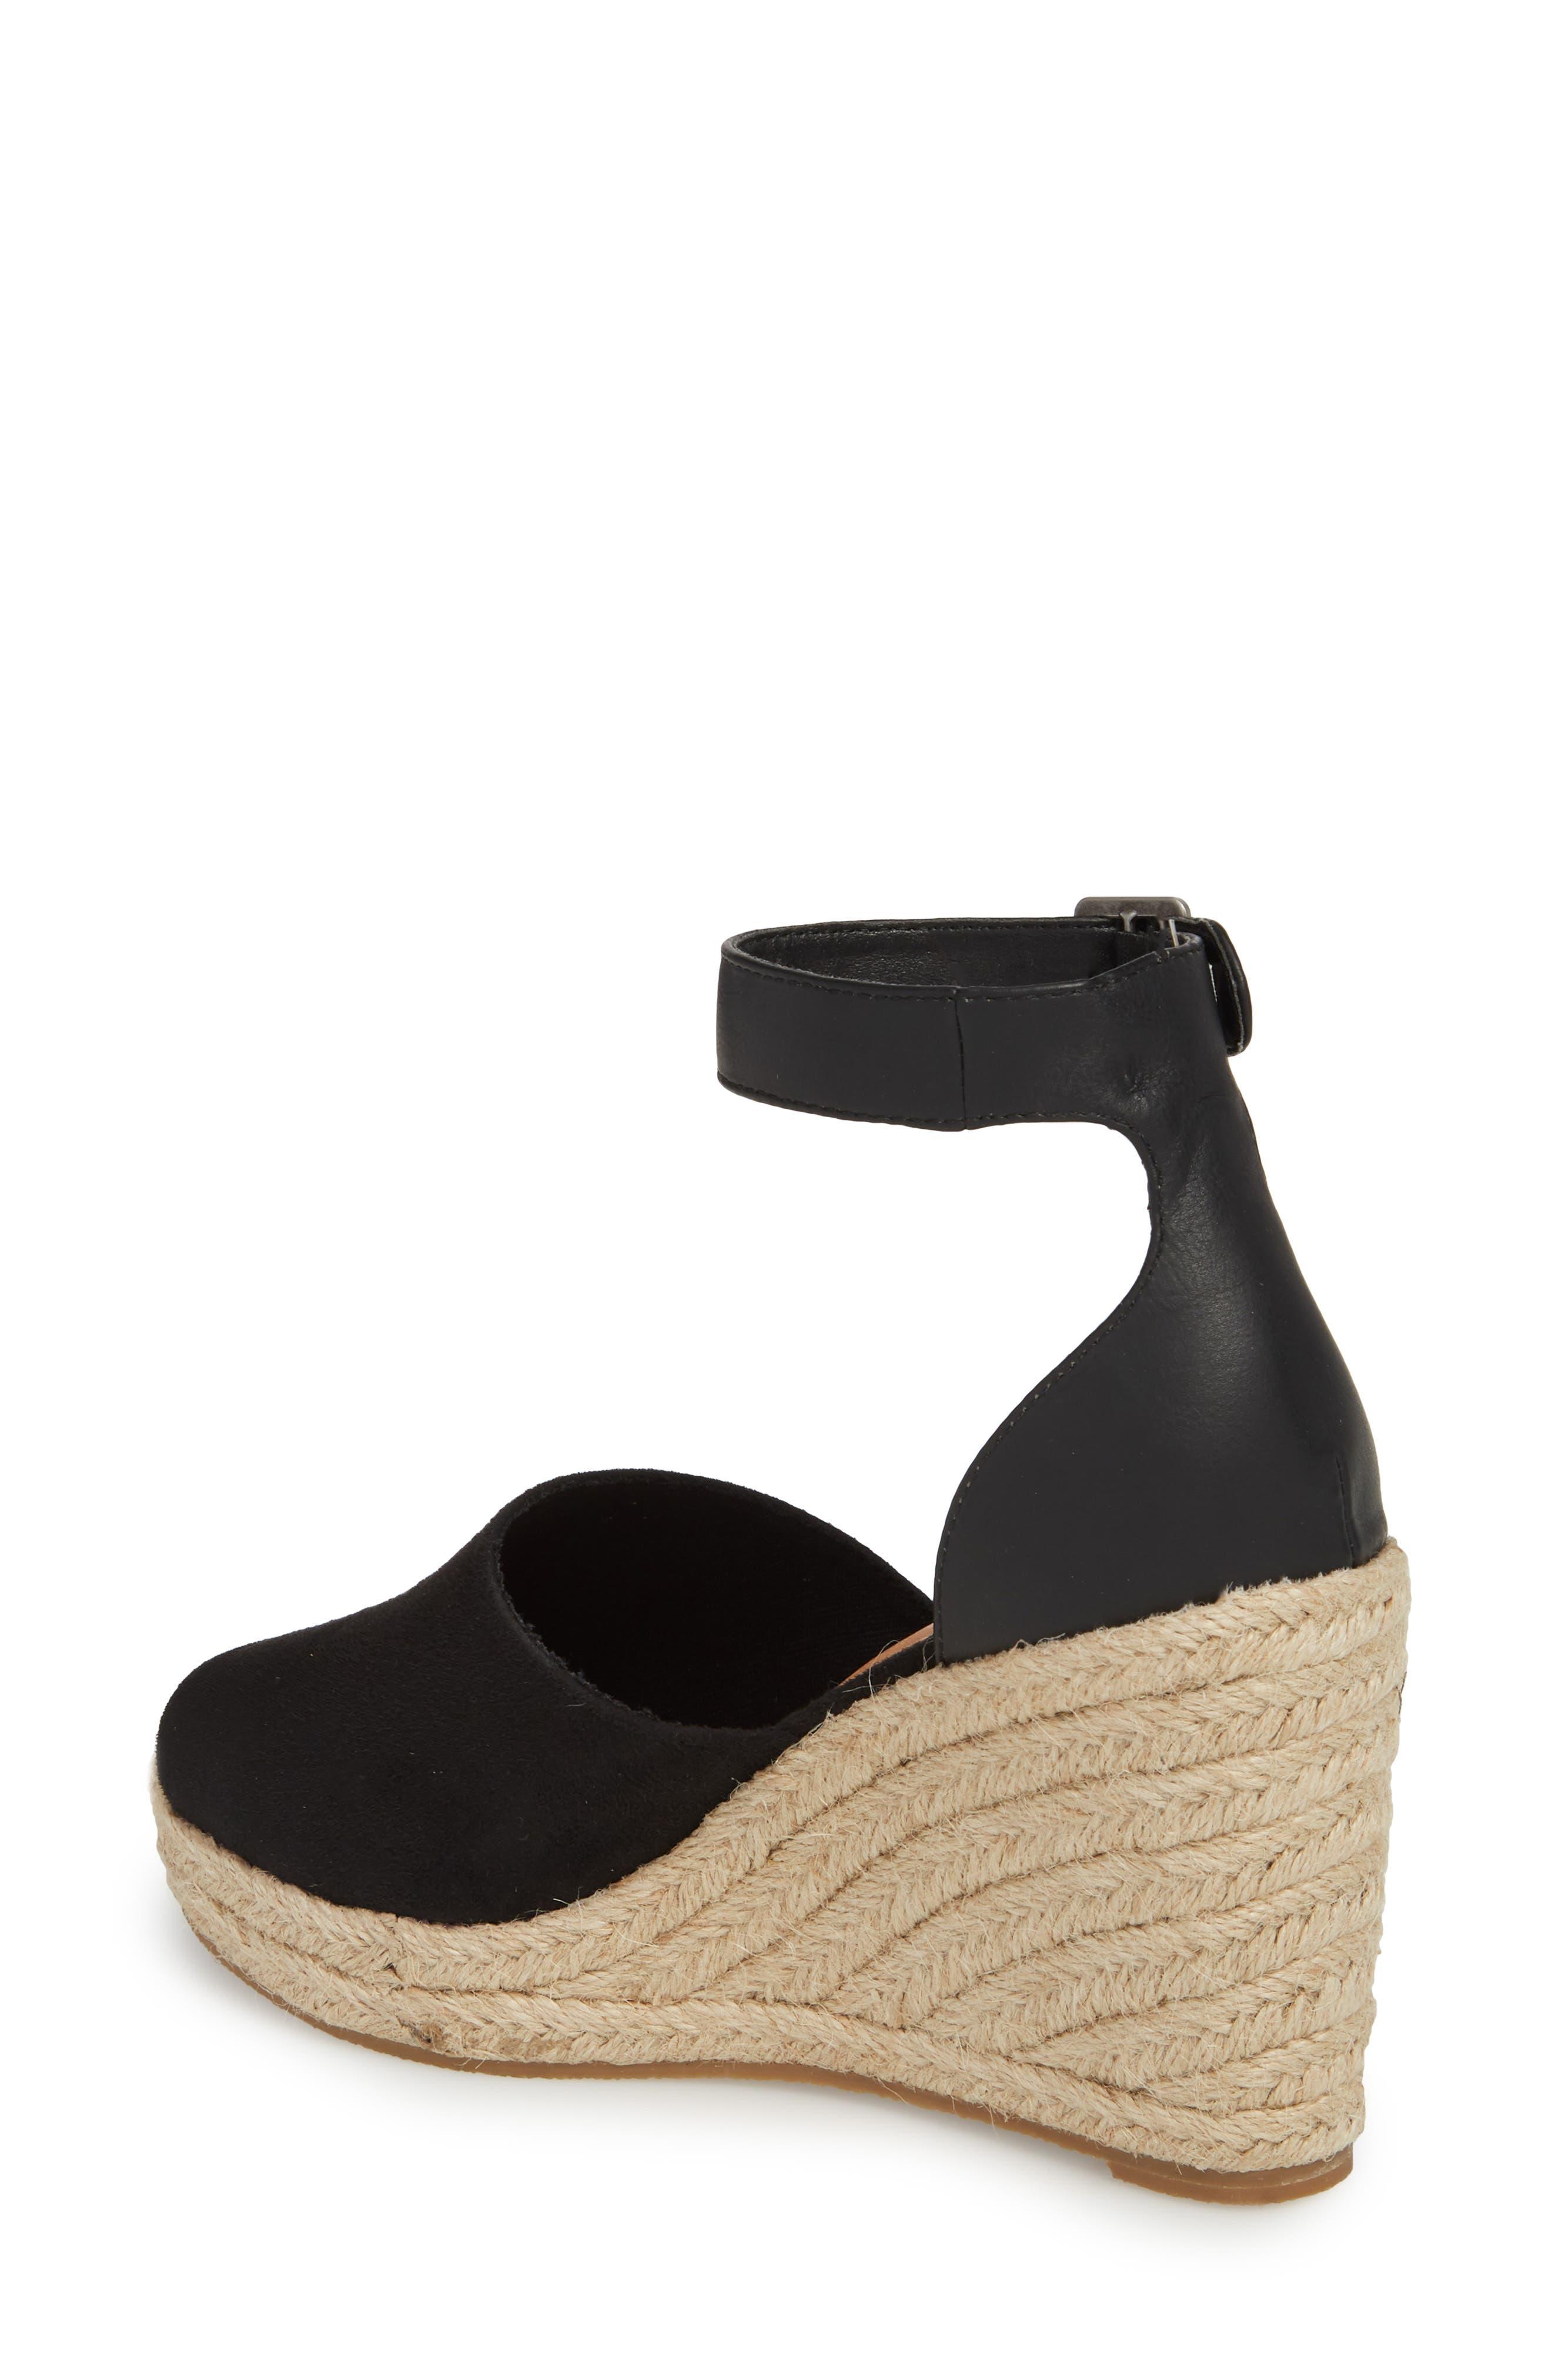 Flamingo Wedge Sandal,                             Alternate thumbnail 2, color,                             Black Suede